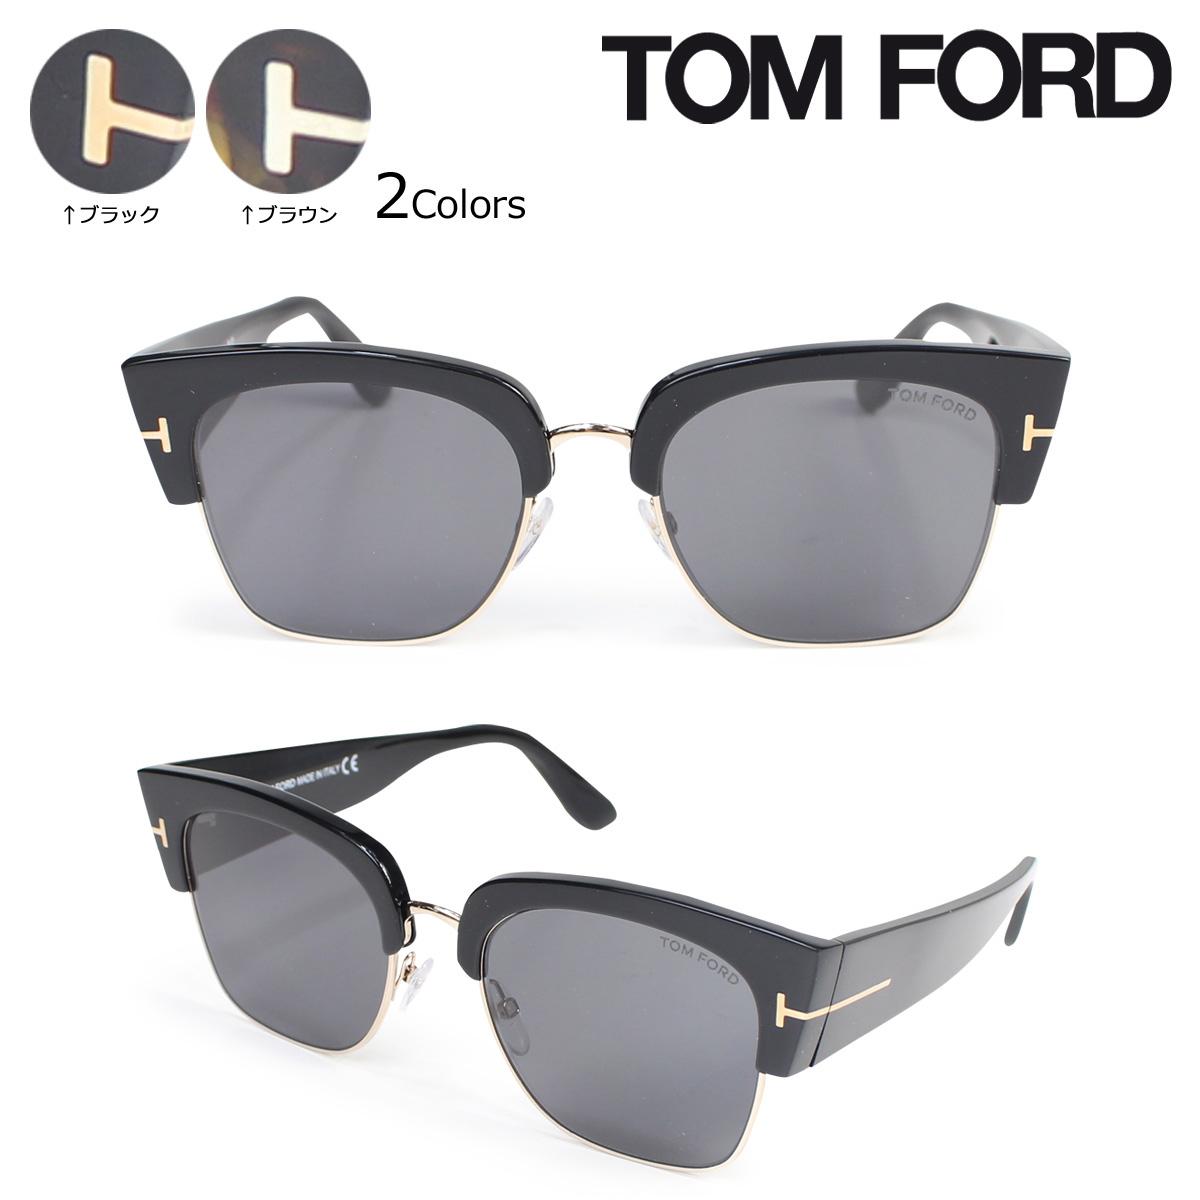 TOM FORD トムフォード サングラス メガネ メンズ レディース アイウェア FT0554 DAKOTA SUNGLASSES 2カラー